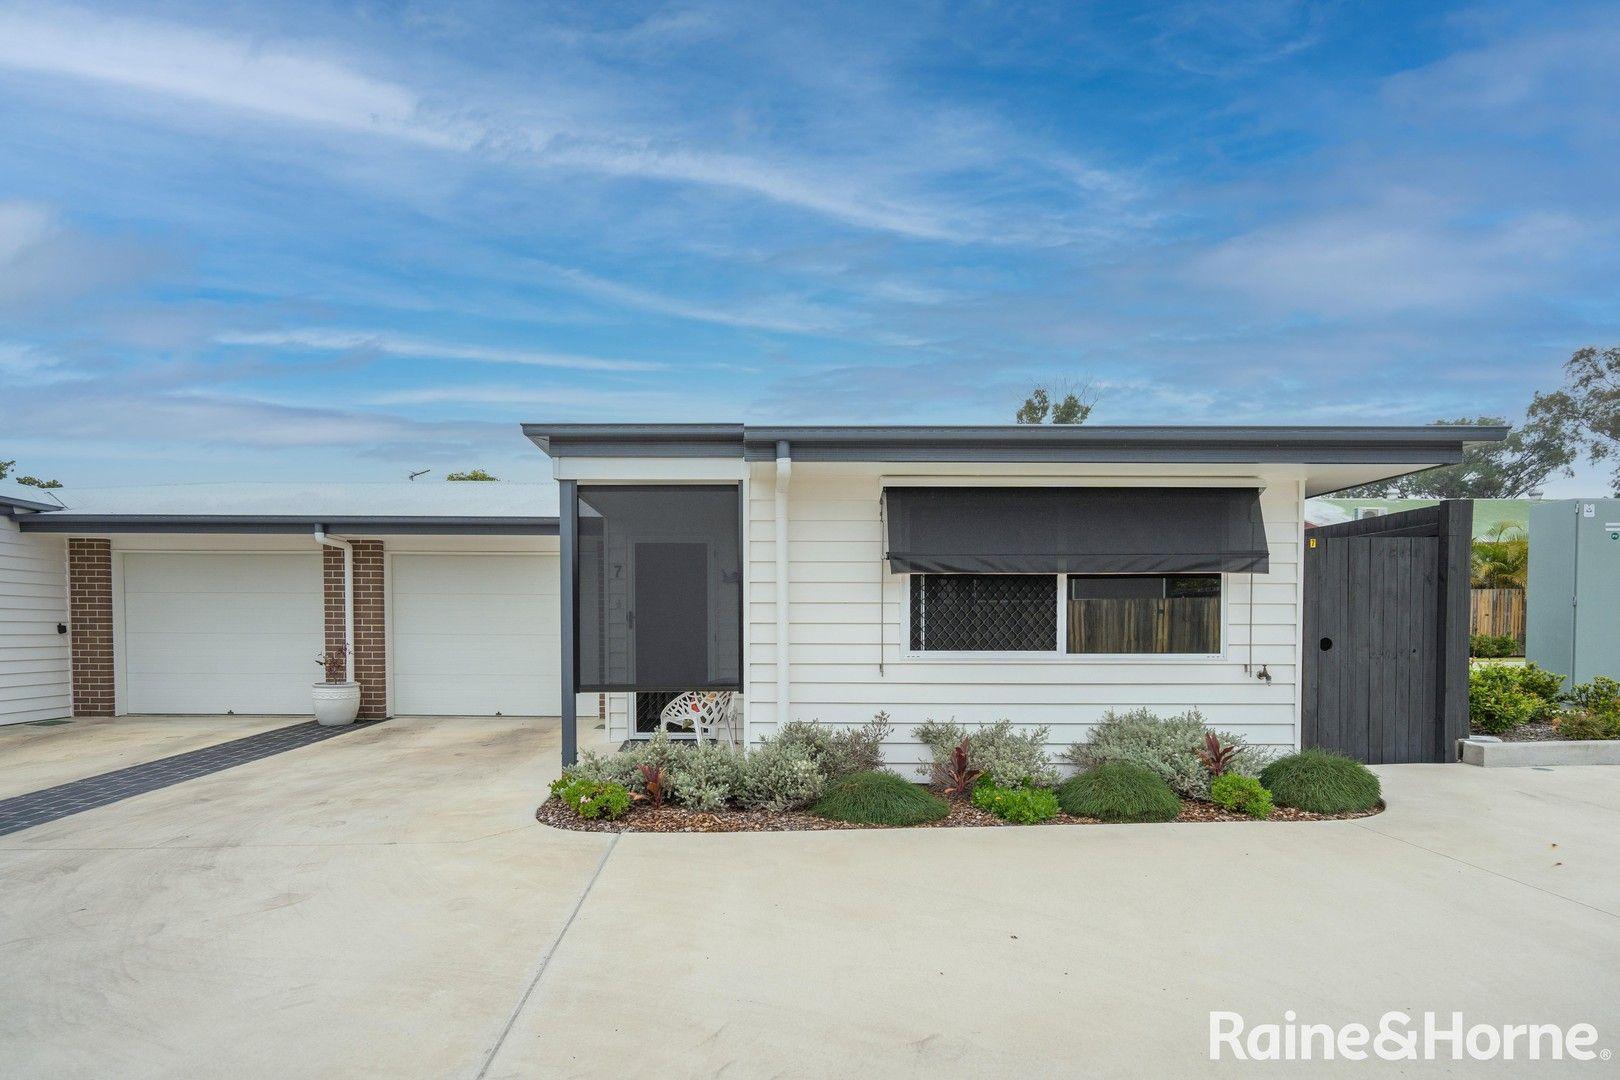 7/235 Torquay Terrace, Torquay QLD 4655, Image 0